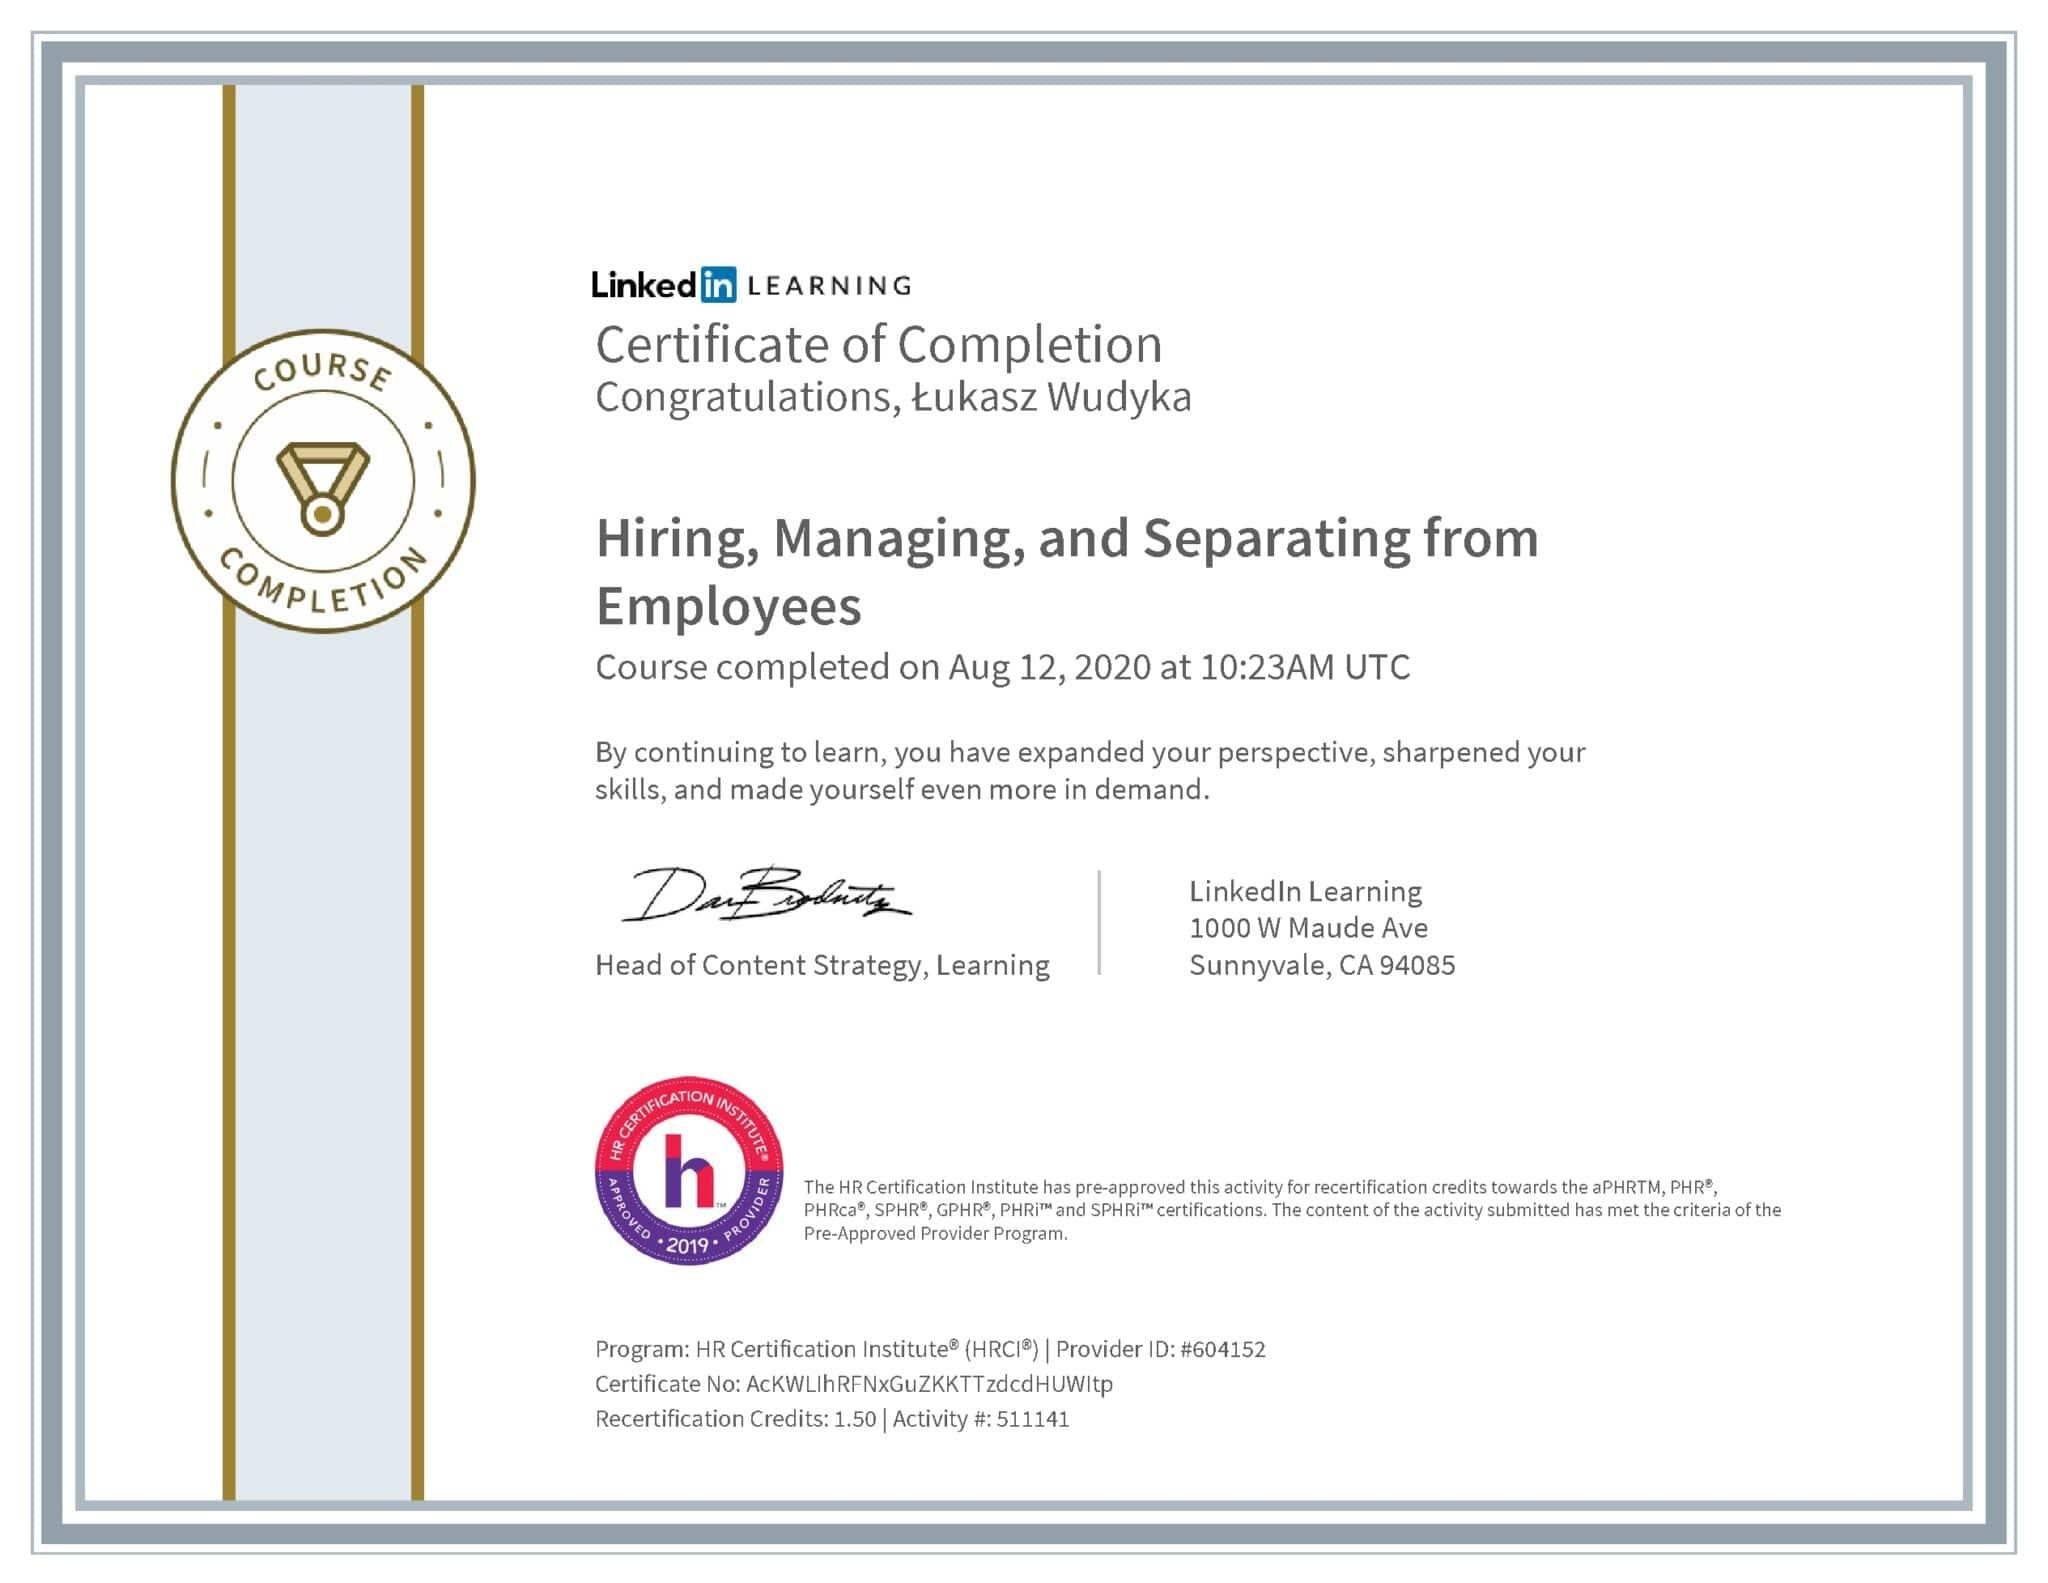 Łukasz Wudyka certyfikat LinkedIn Hiring, Managing, and Separating from Employees HRCI